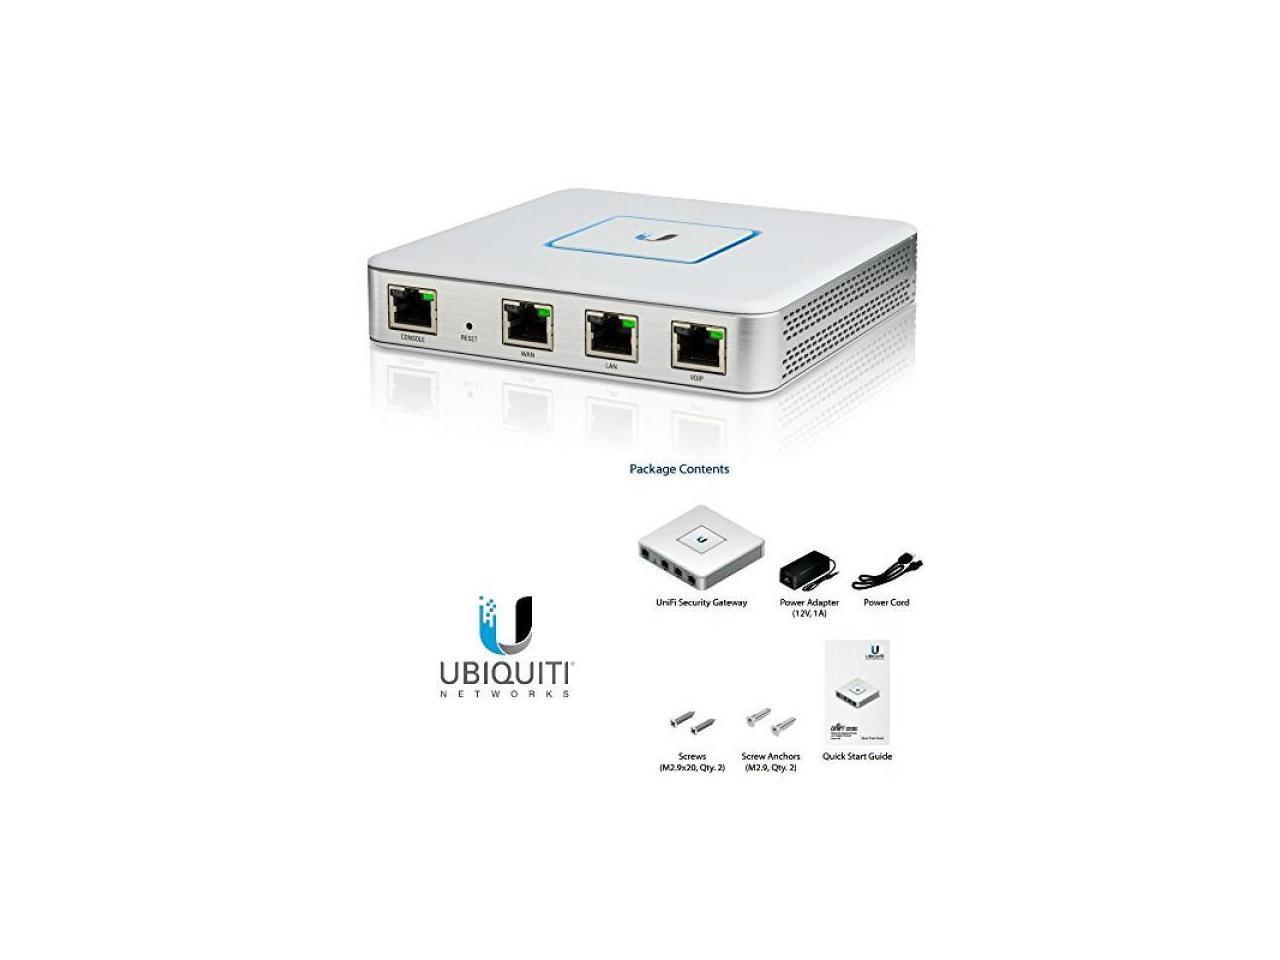 Details about Ubiquiti Networks USG-US Enterprise Gateway Router with  Gigabit Ethernet